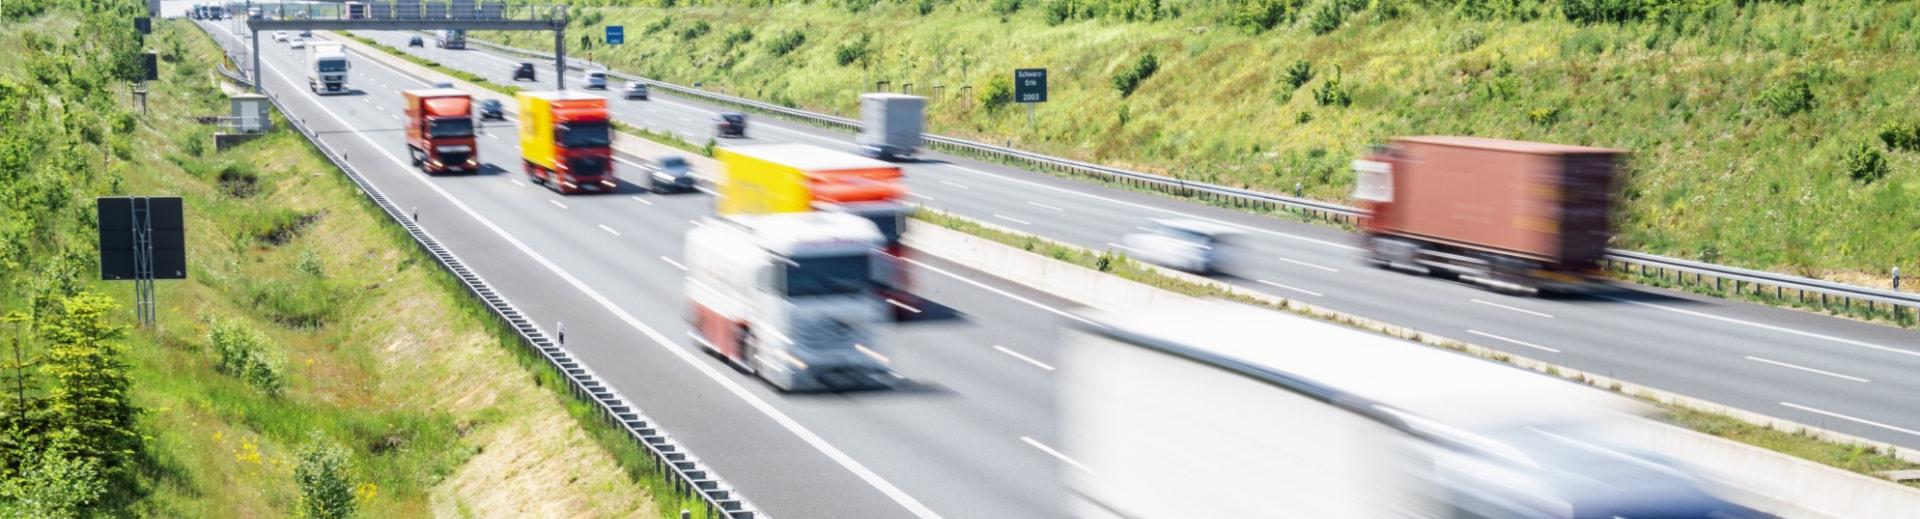 Fachkundeprüfung für Güterkraftverkehrsunternehmen